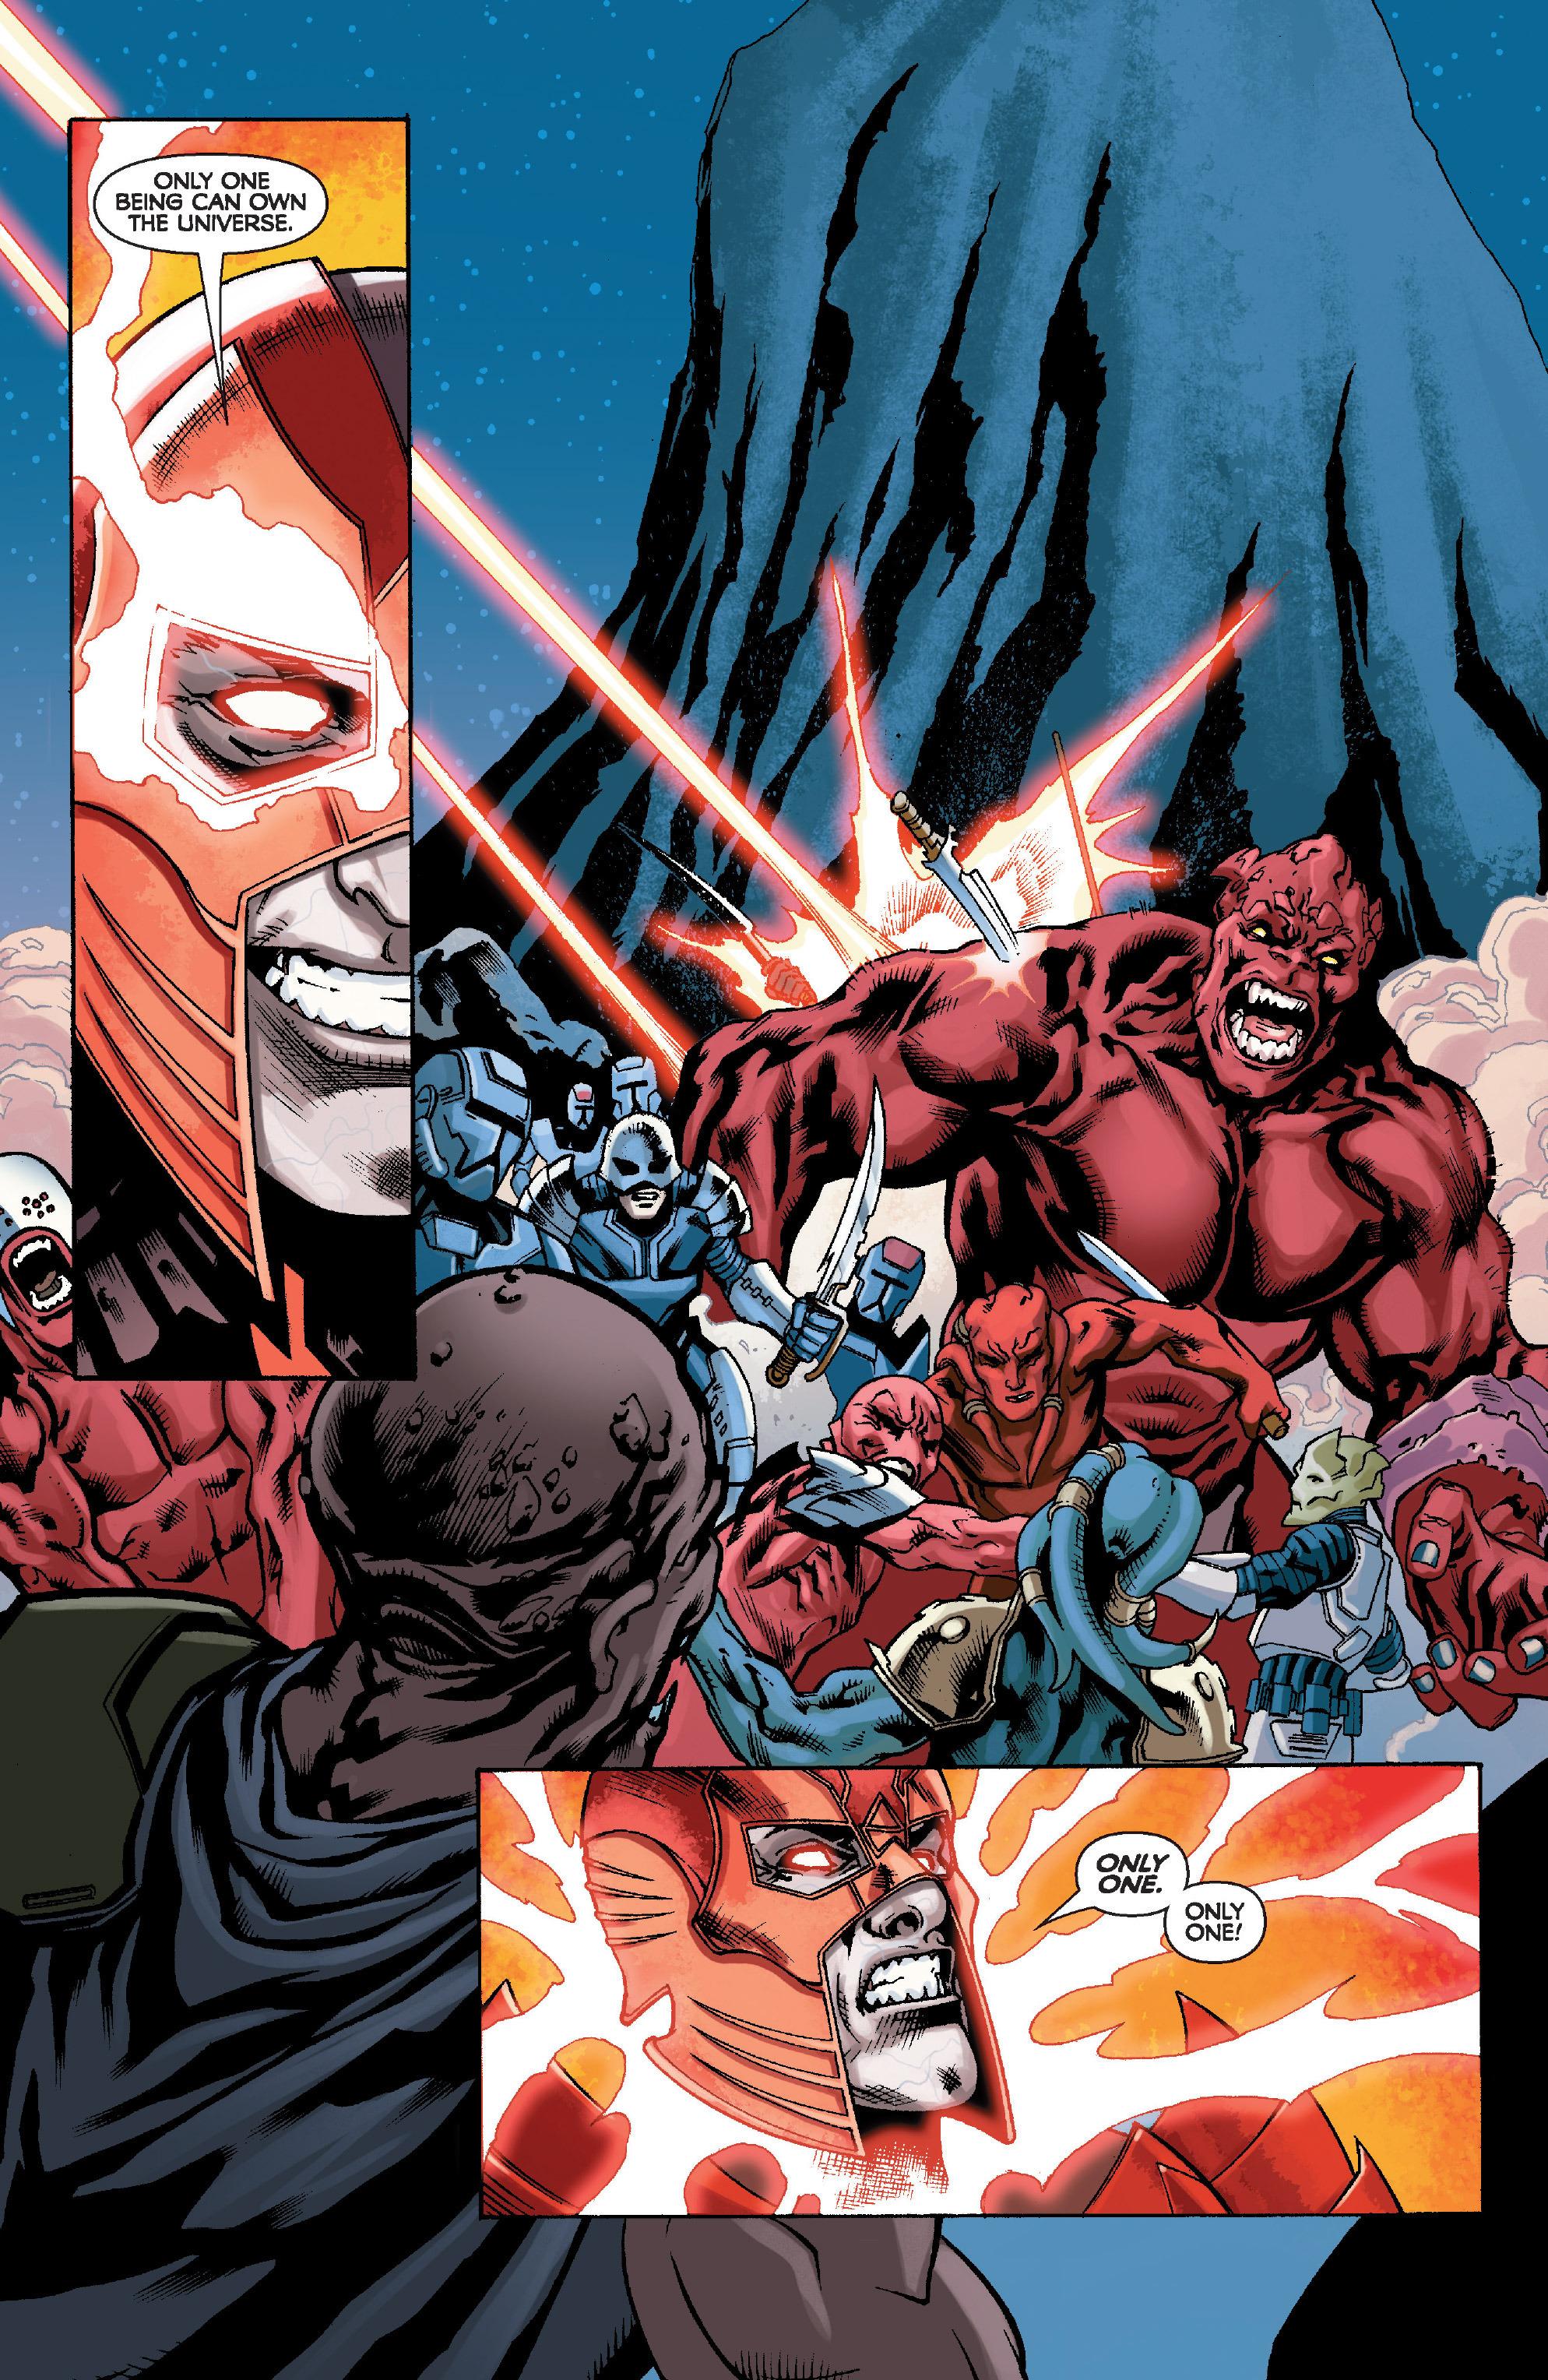 Read online Star Wars: Knight Errant - Escape comic -  Issue #4 - 13